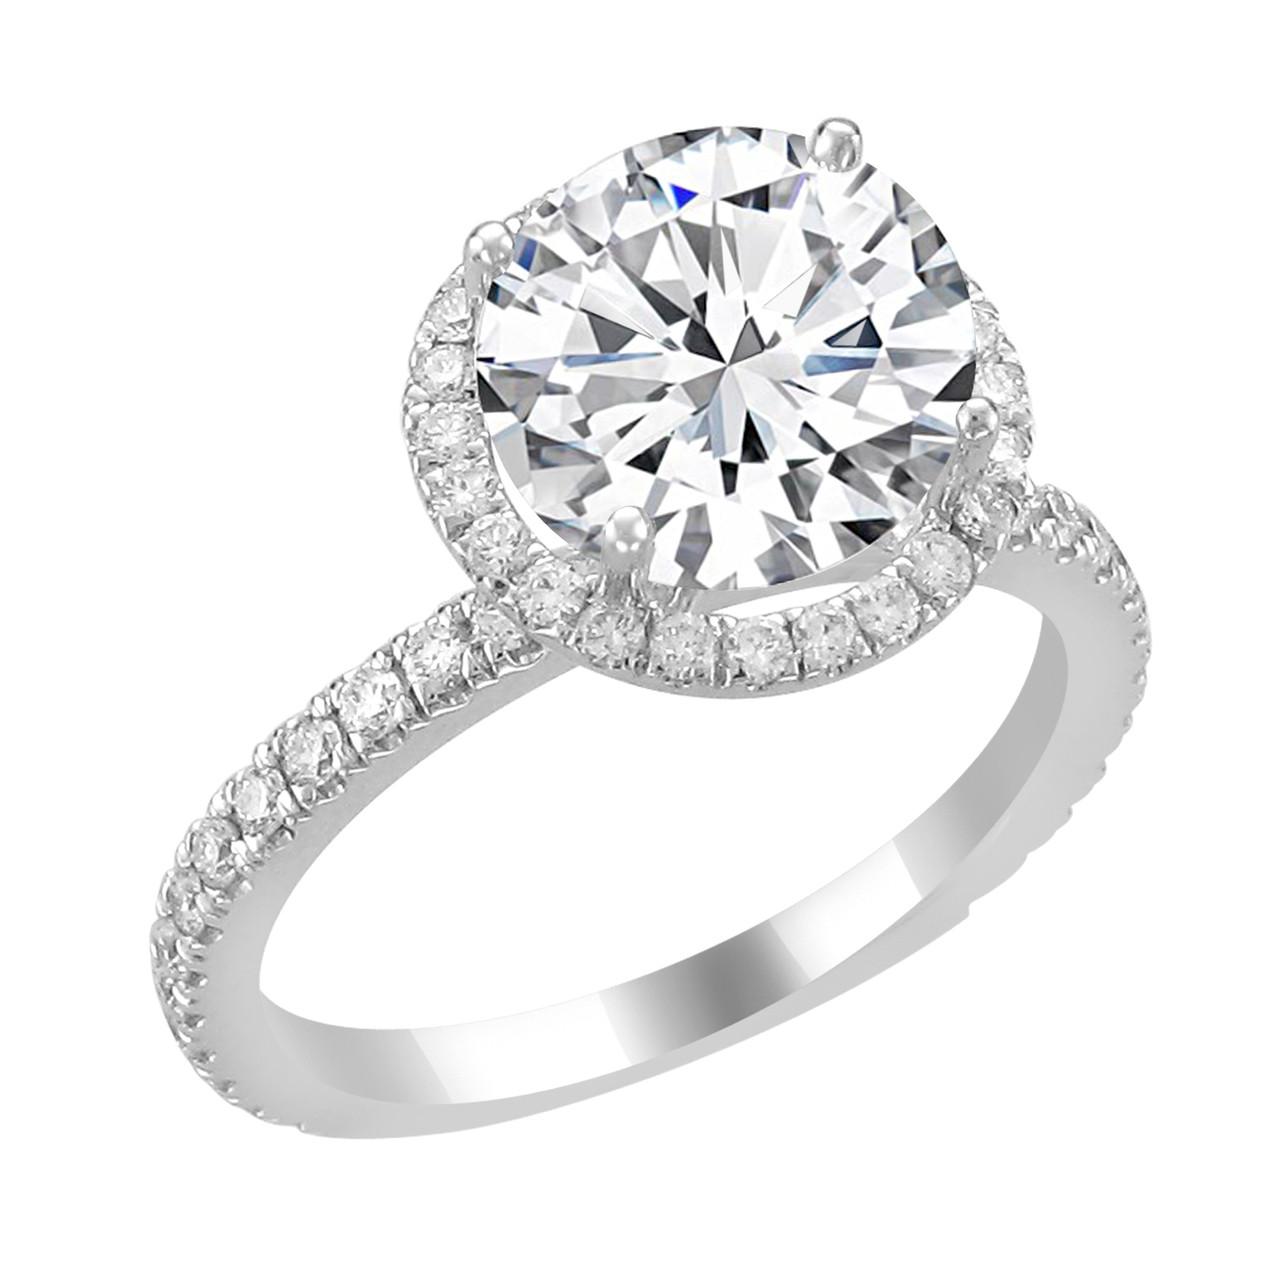 14k White Gold Diamond Ring Wedding Bands Company Chicago